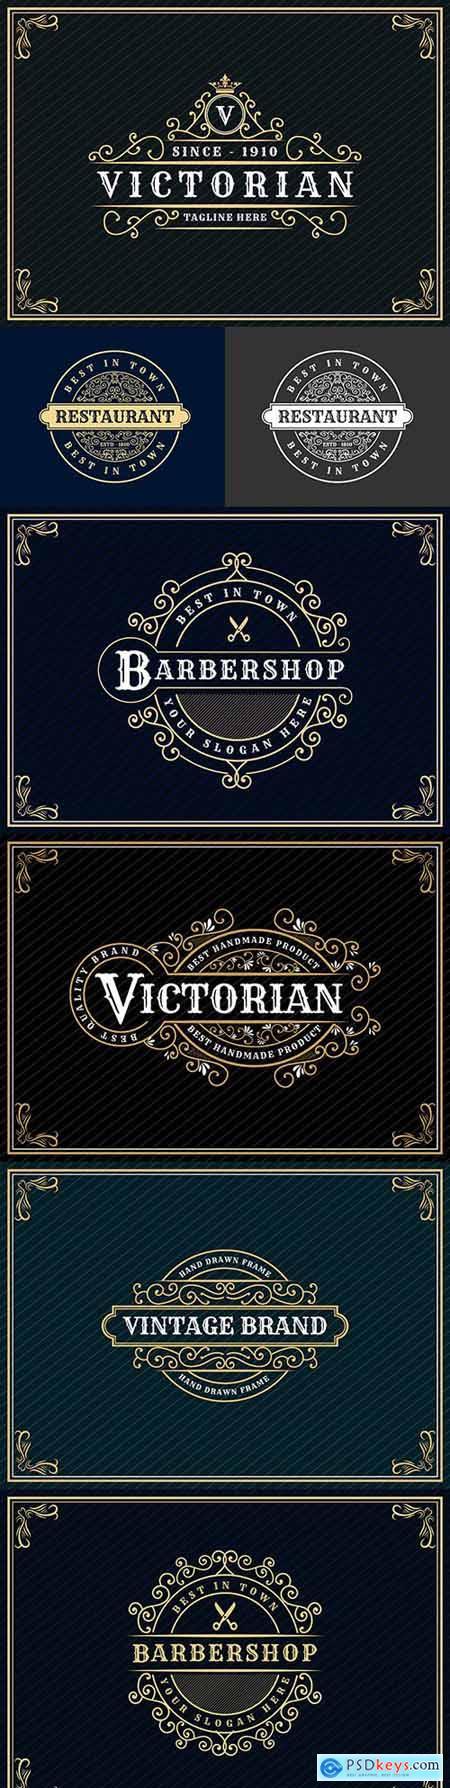 Luxury royal vintage design logo with decorative frame